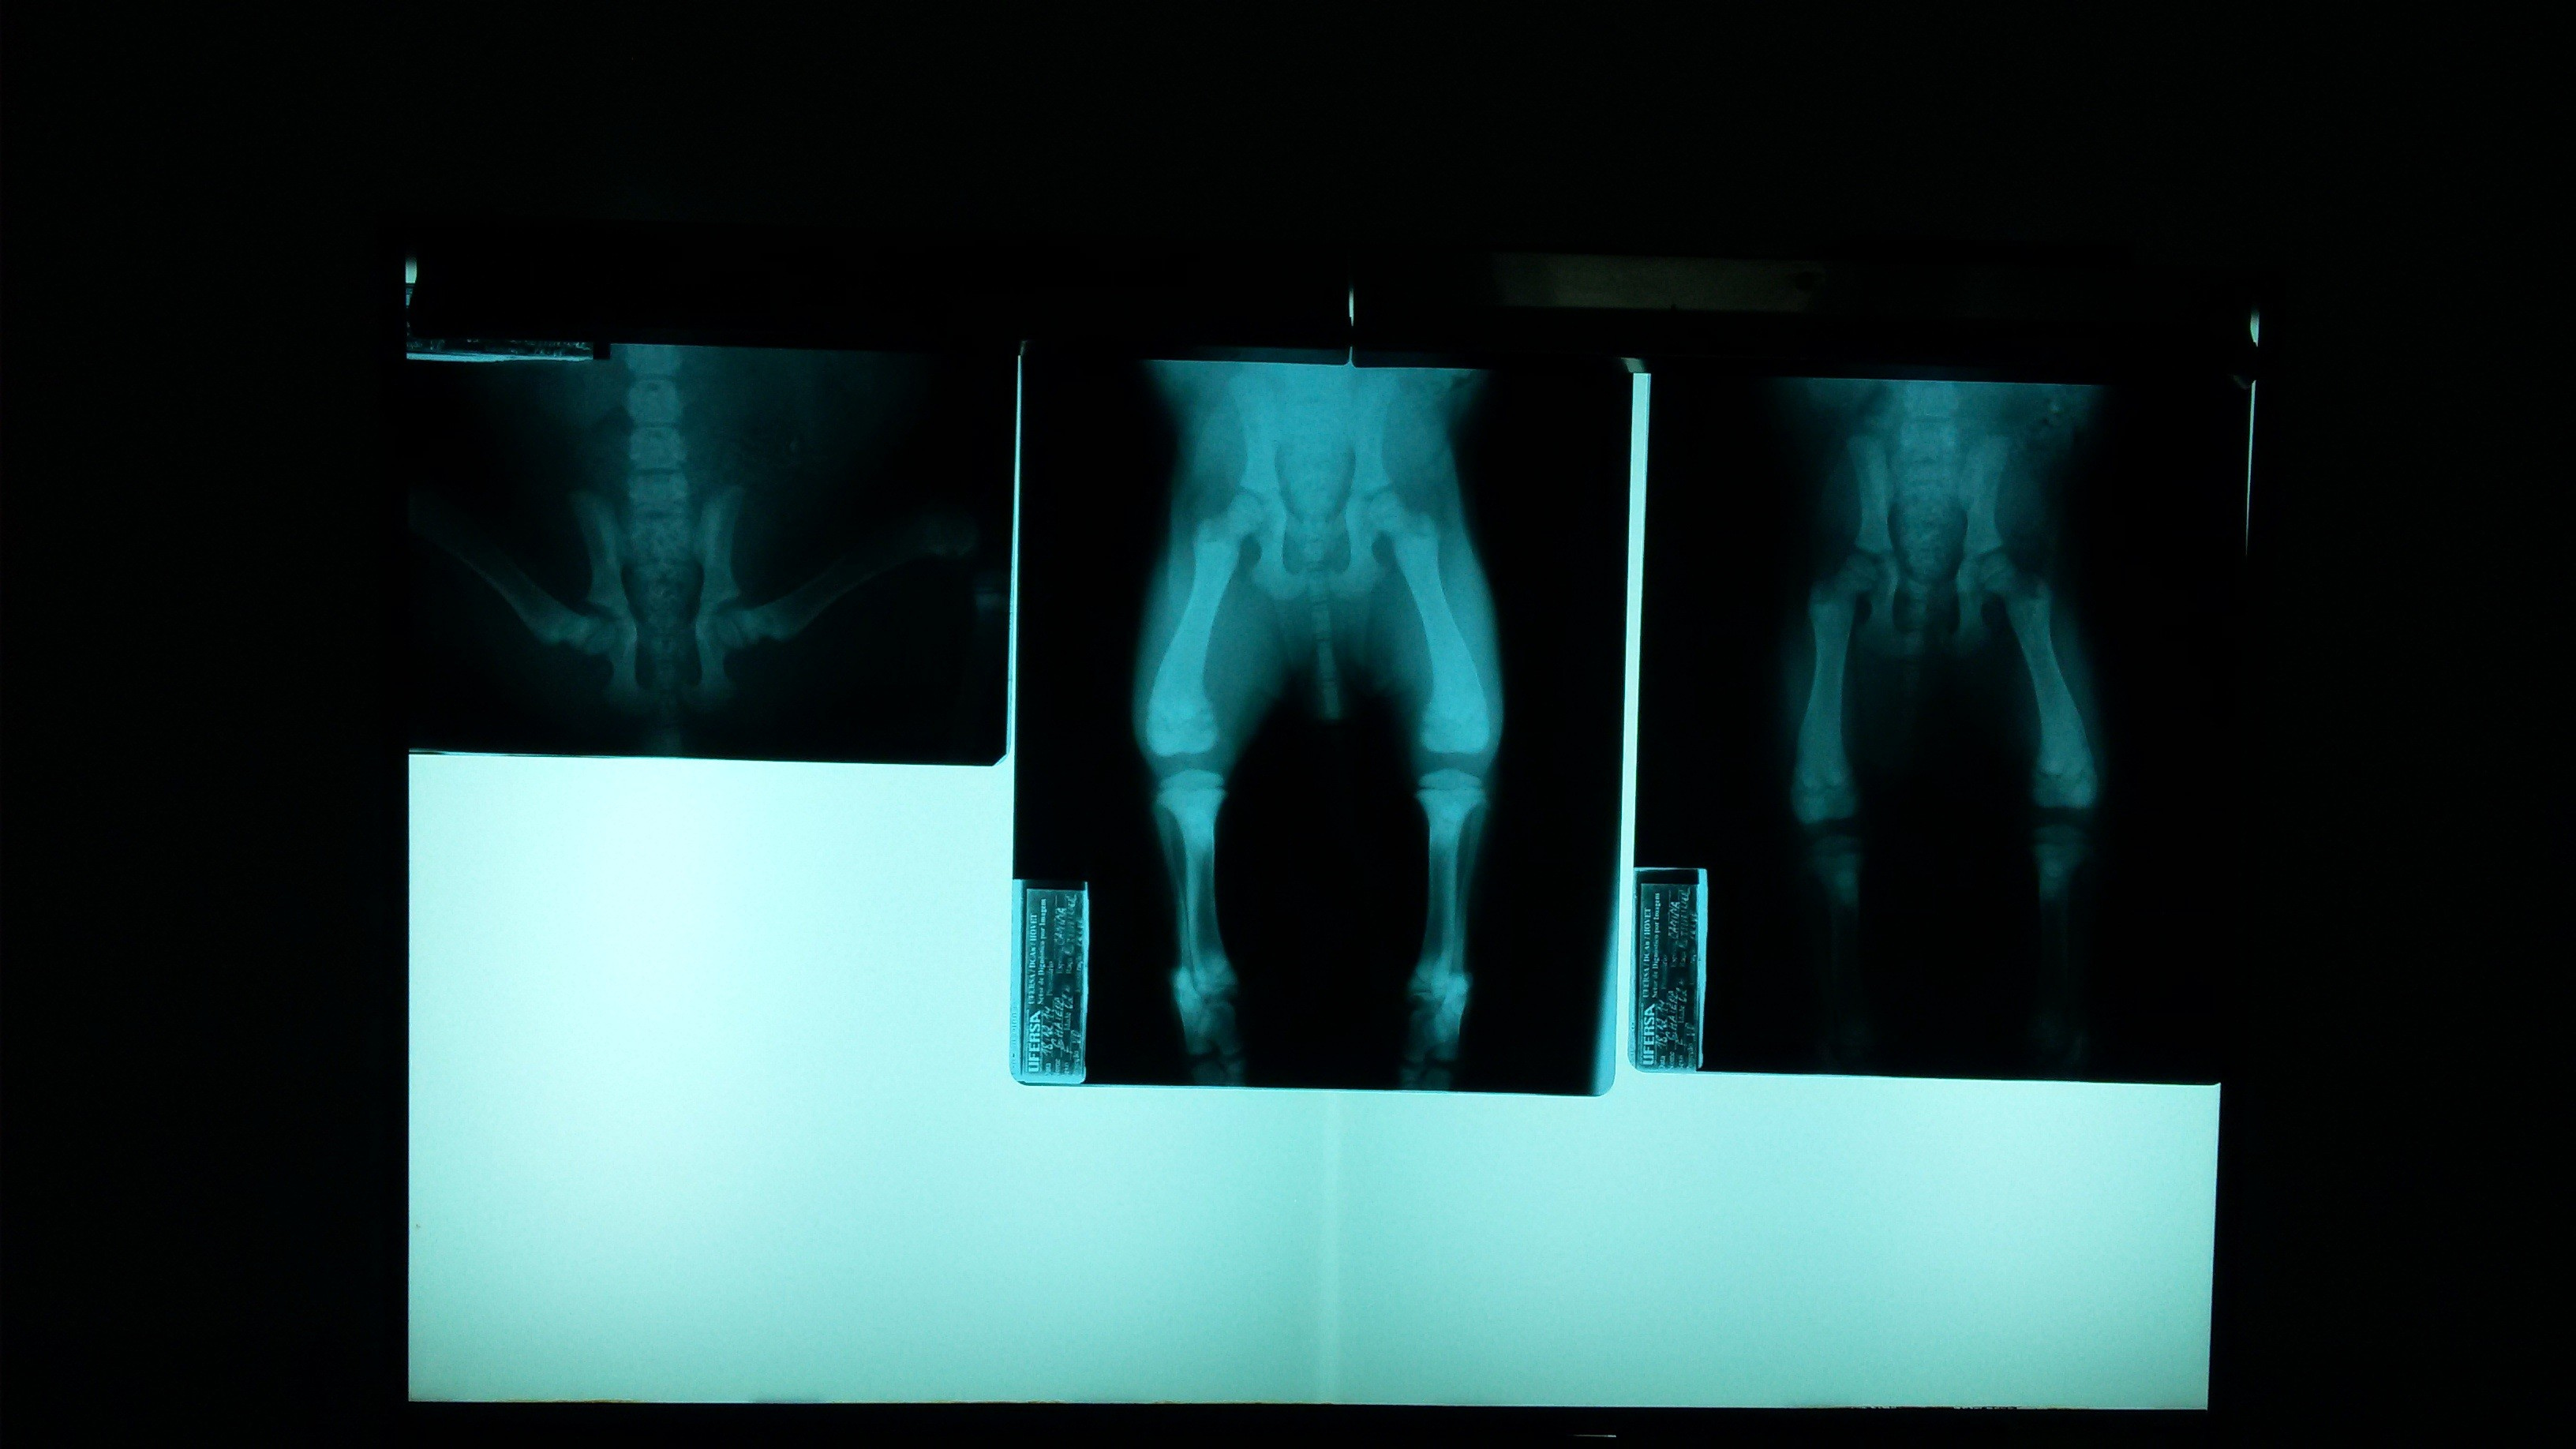 light color darkness lighting stage image screenshot veterinary sense  special effects computer wallpaper radiograph pelvis